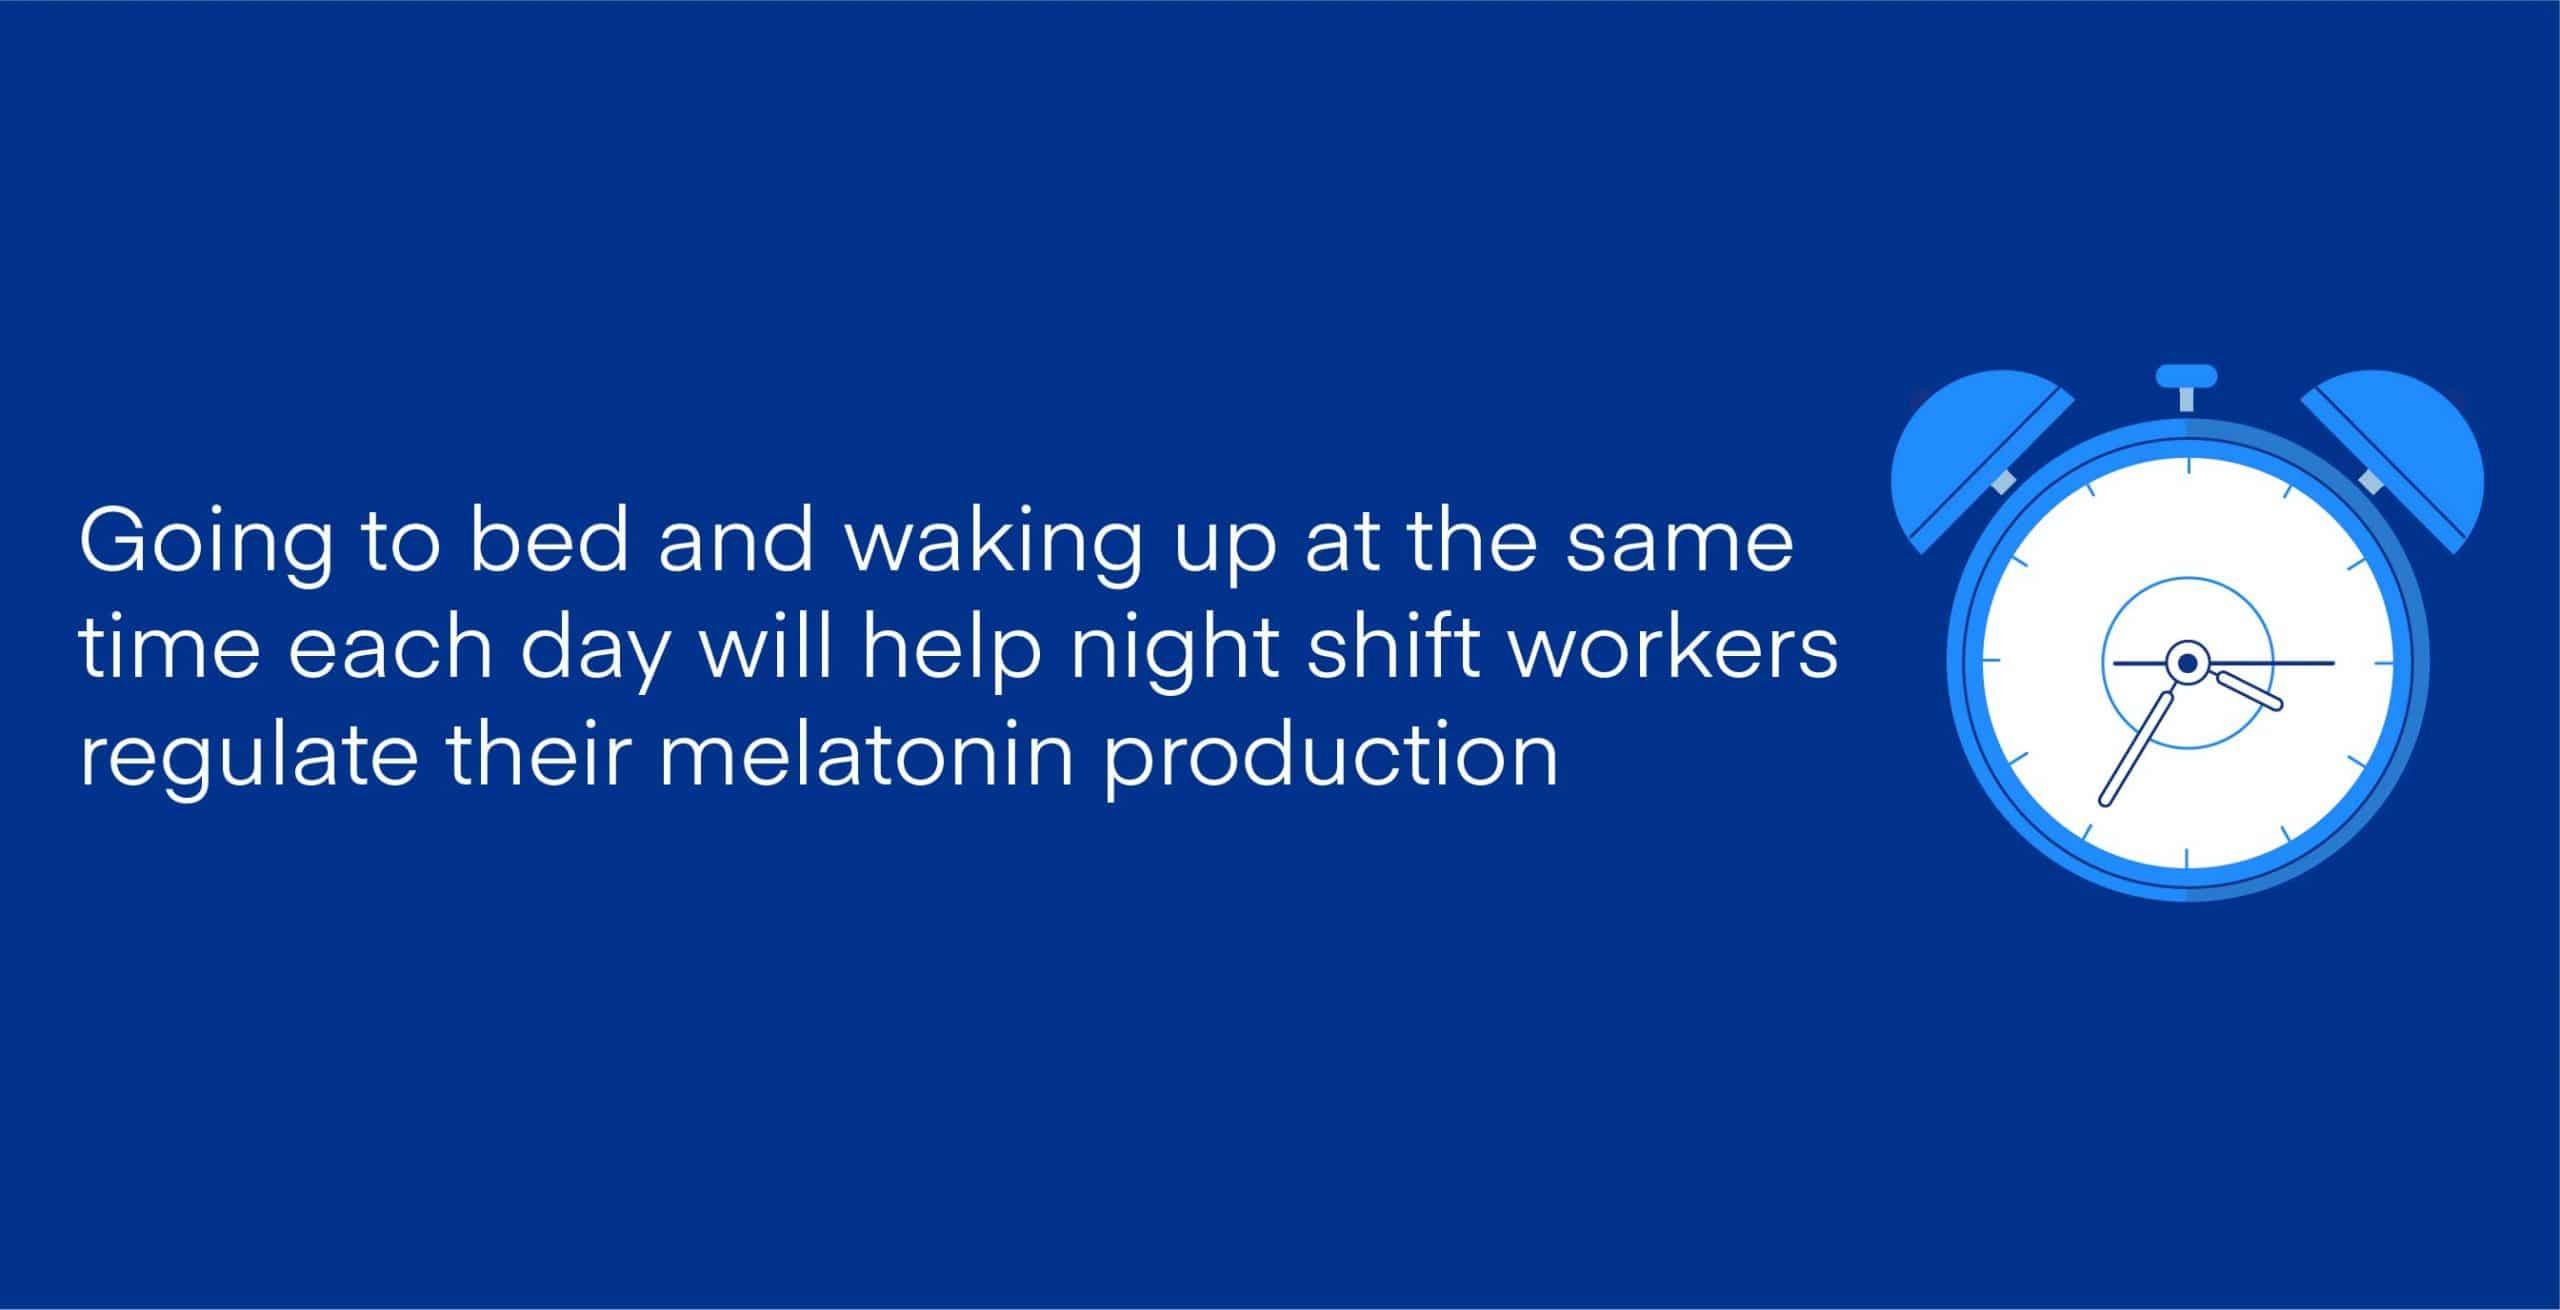 Can You Overdose on Melatonin